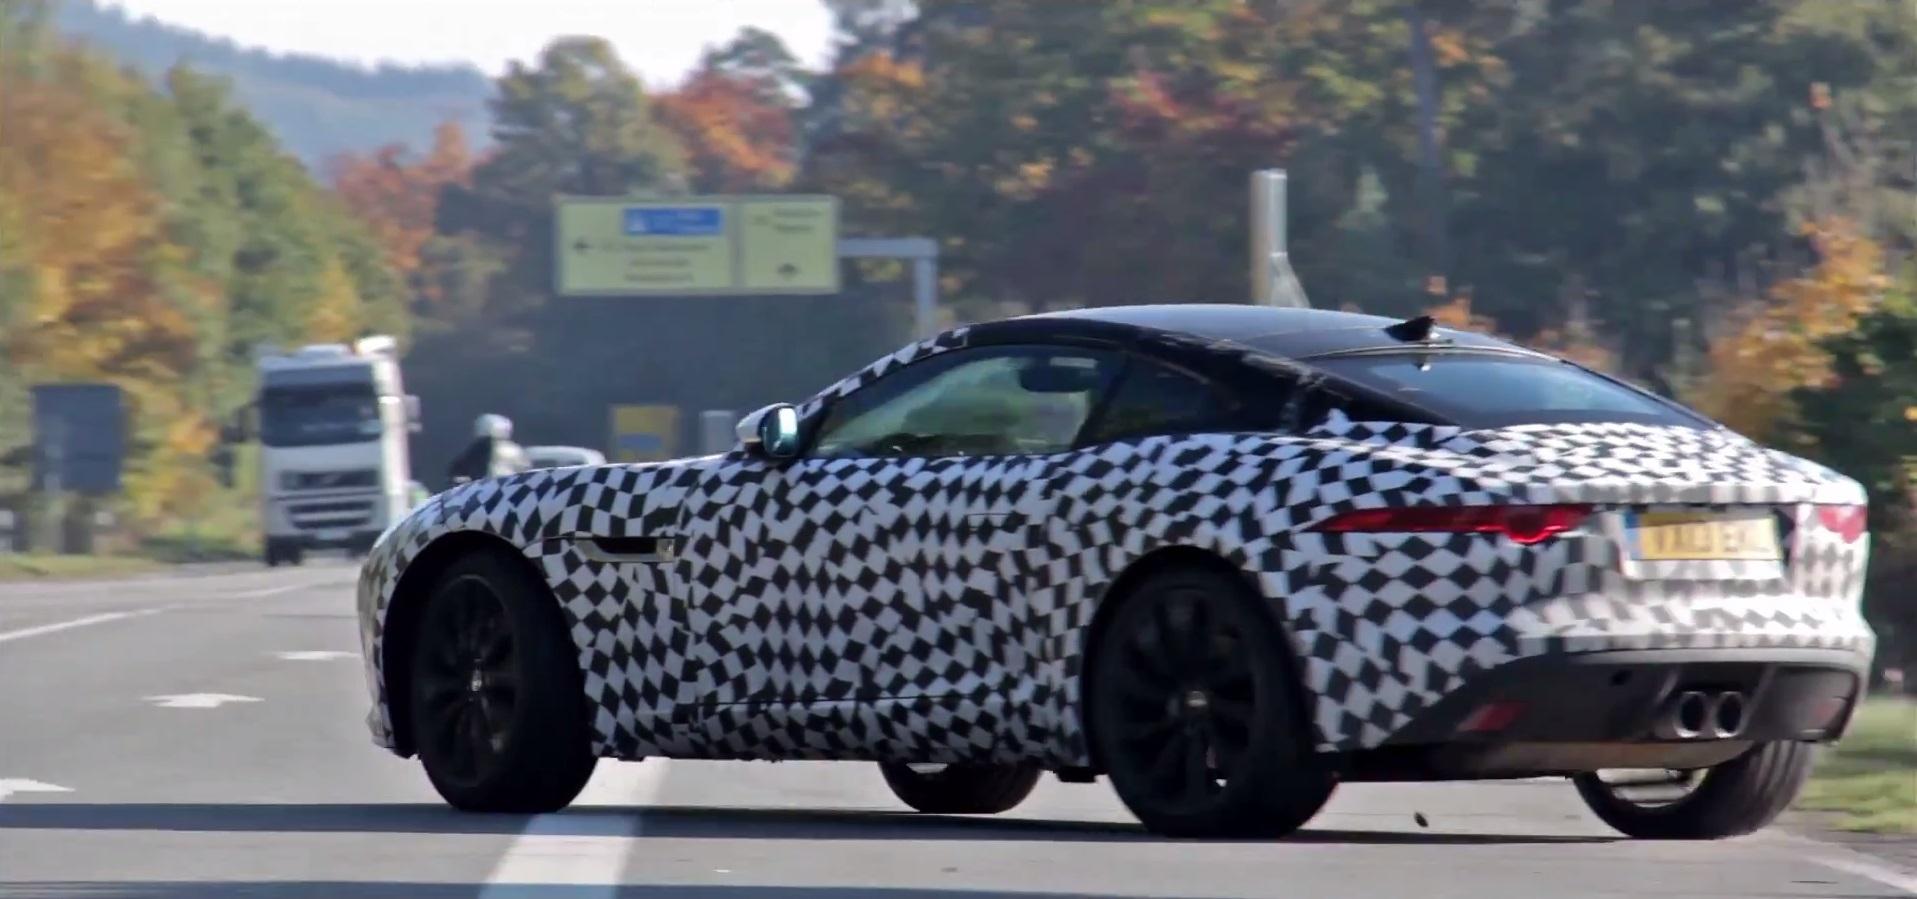 Jaguar F-Type V6 Coupe - www.hartvoorautos.nl